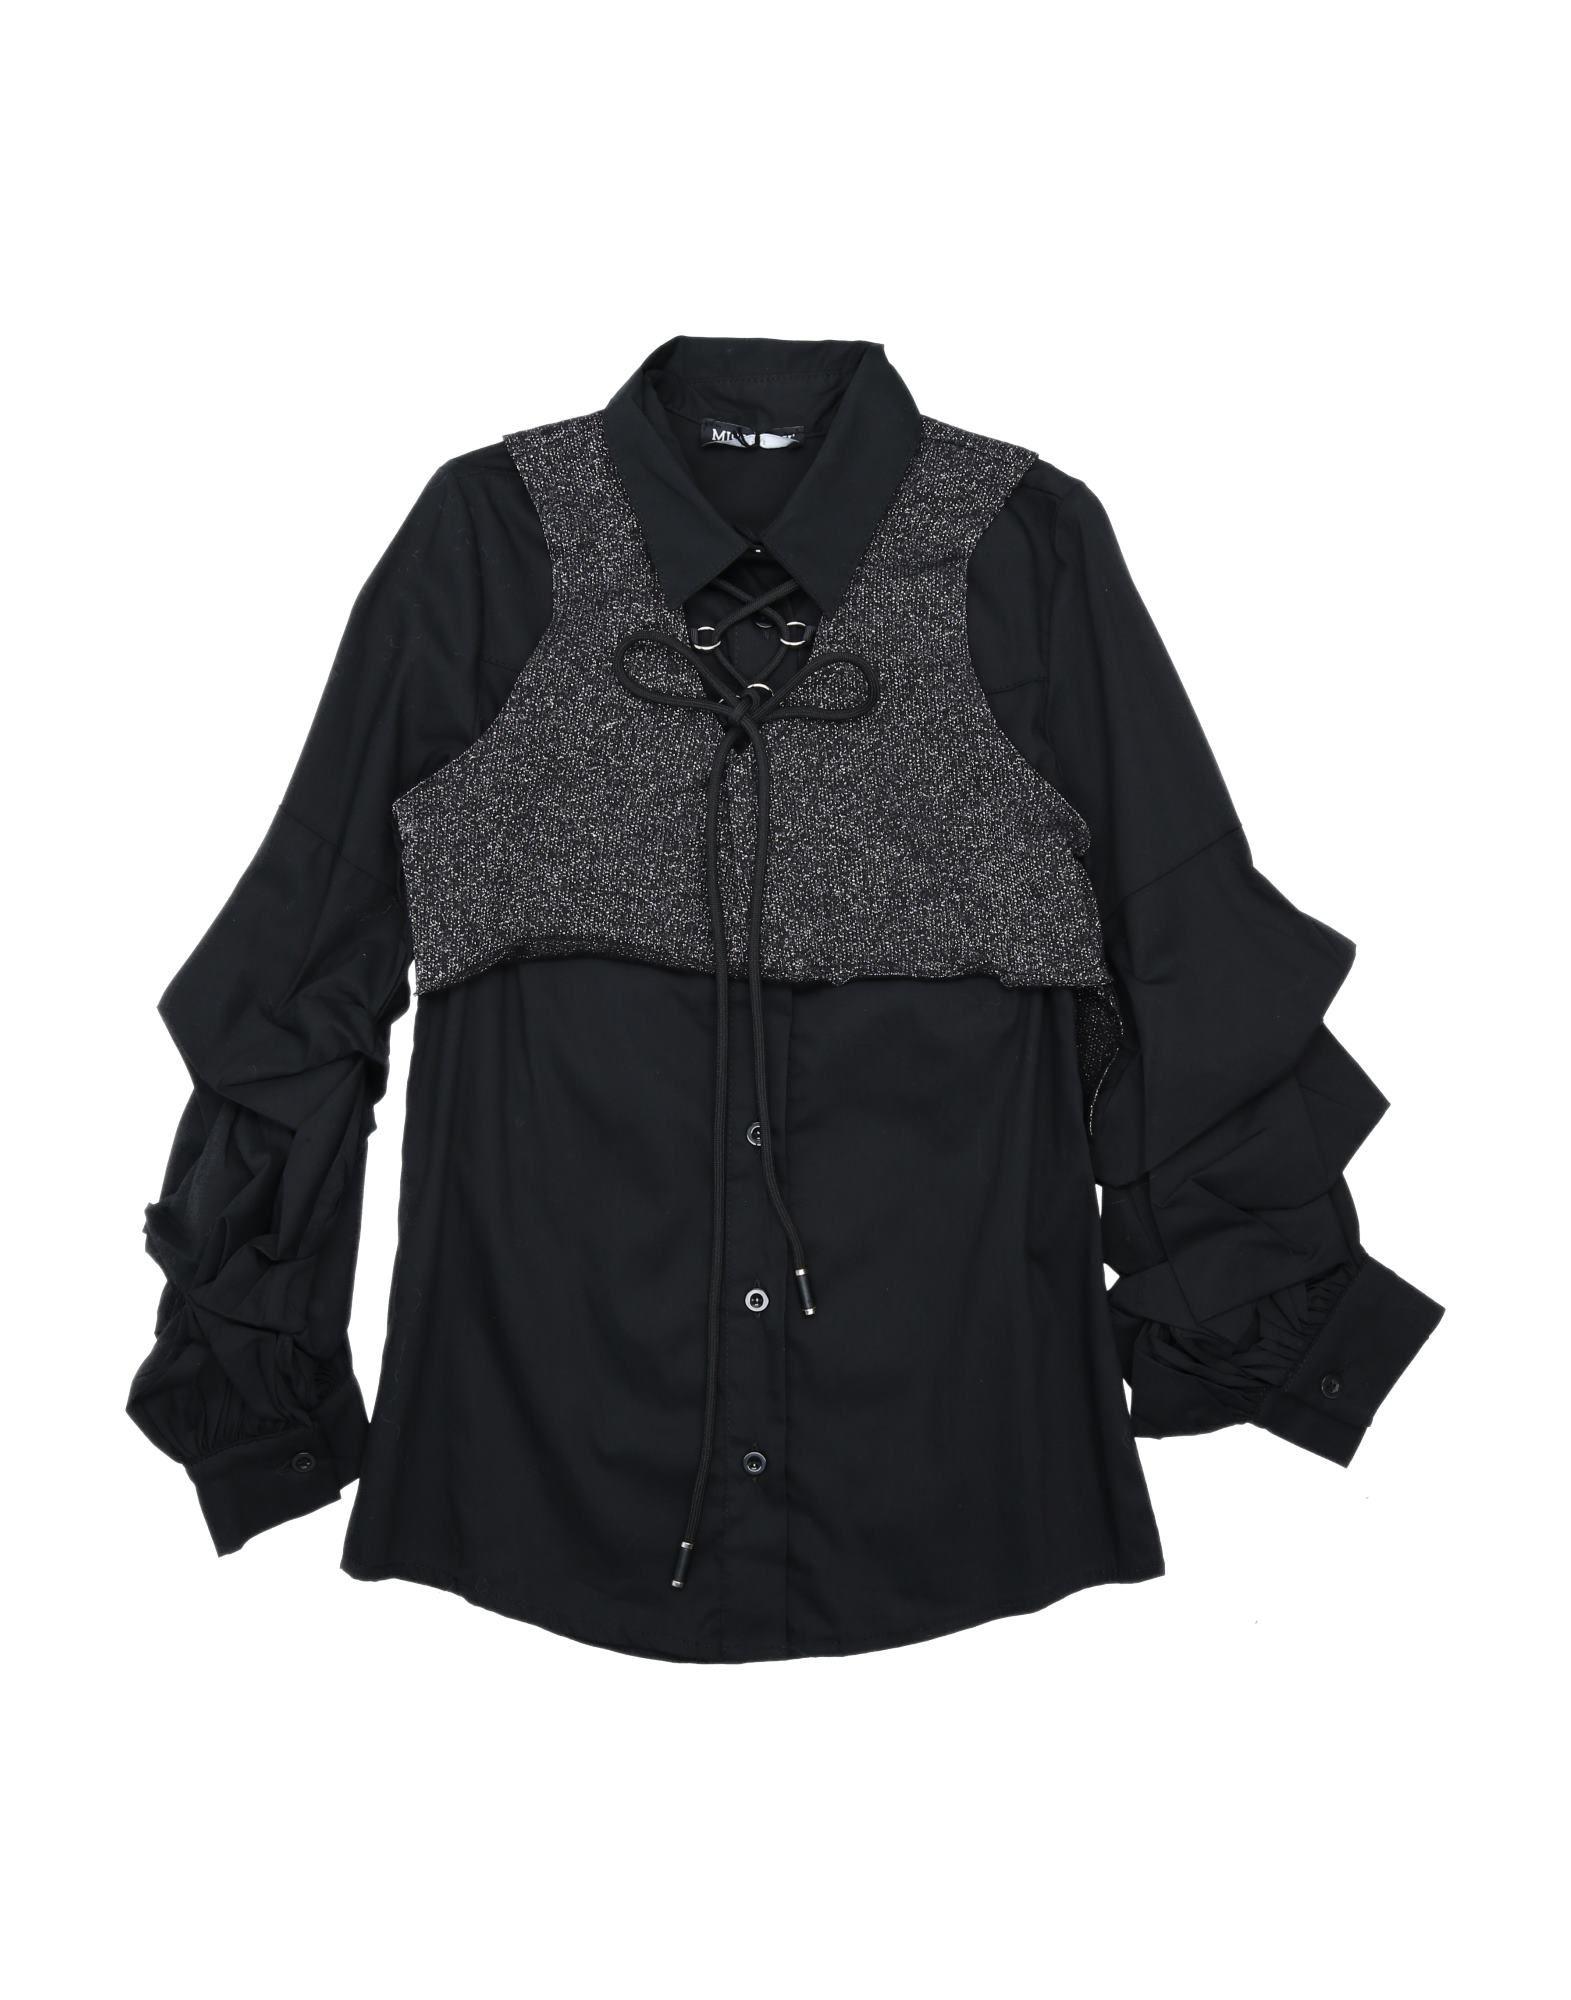 Miss Lulù Kids' Shirts In Black